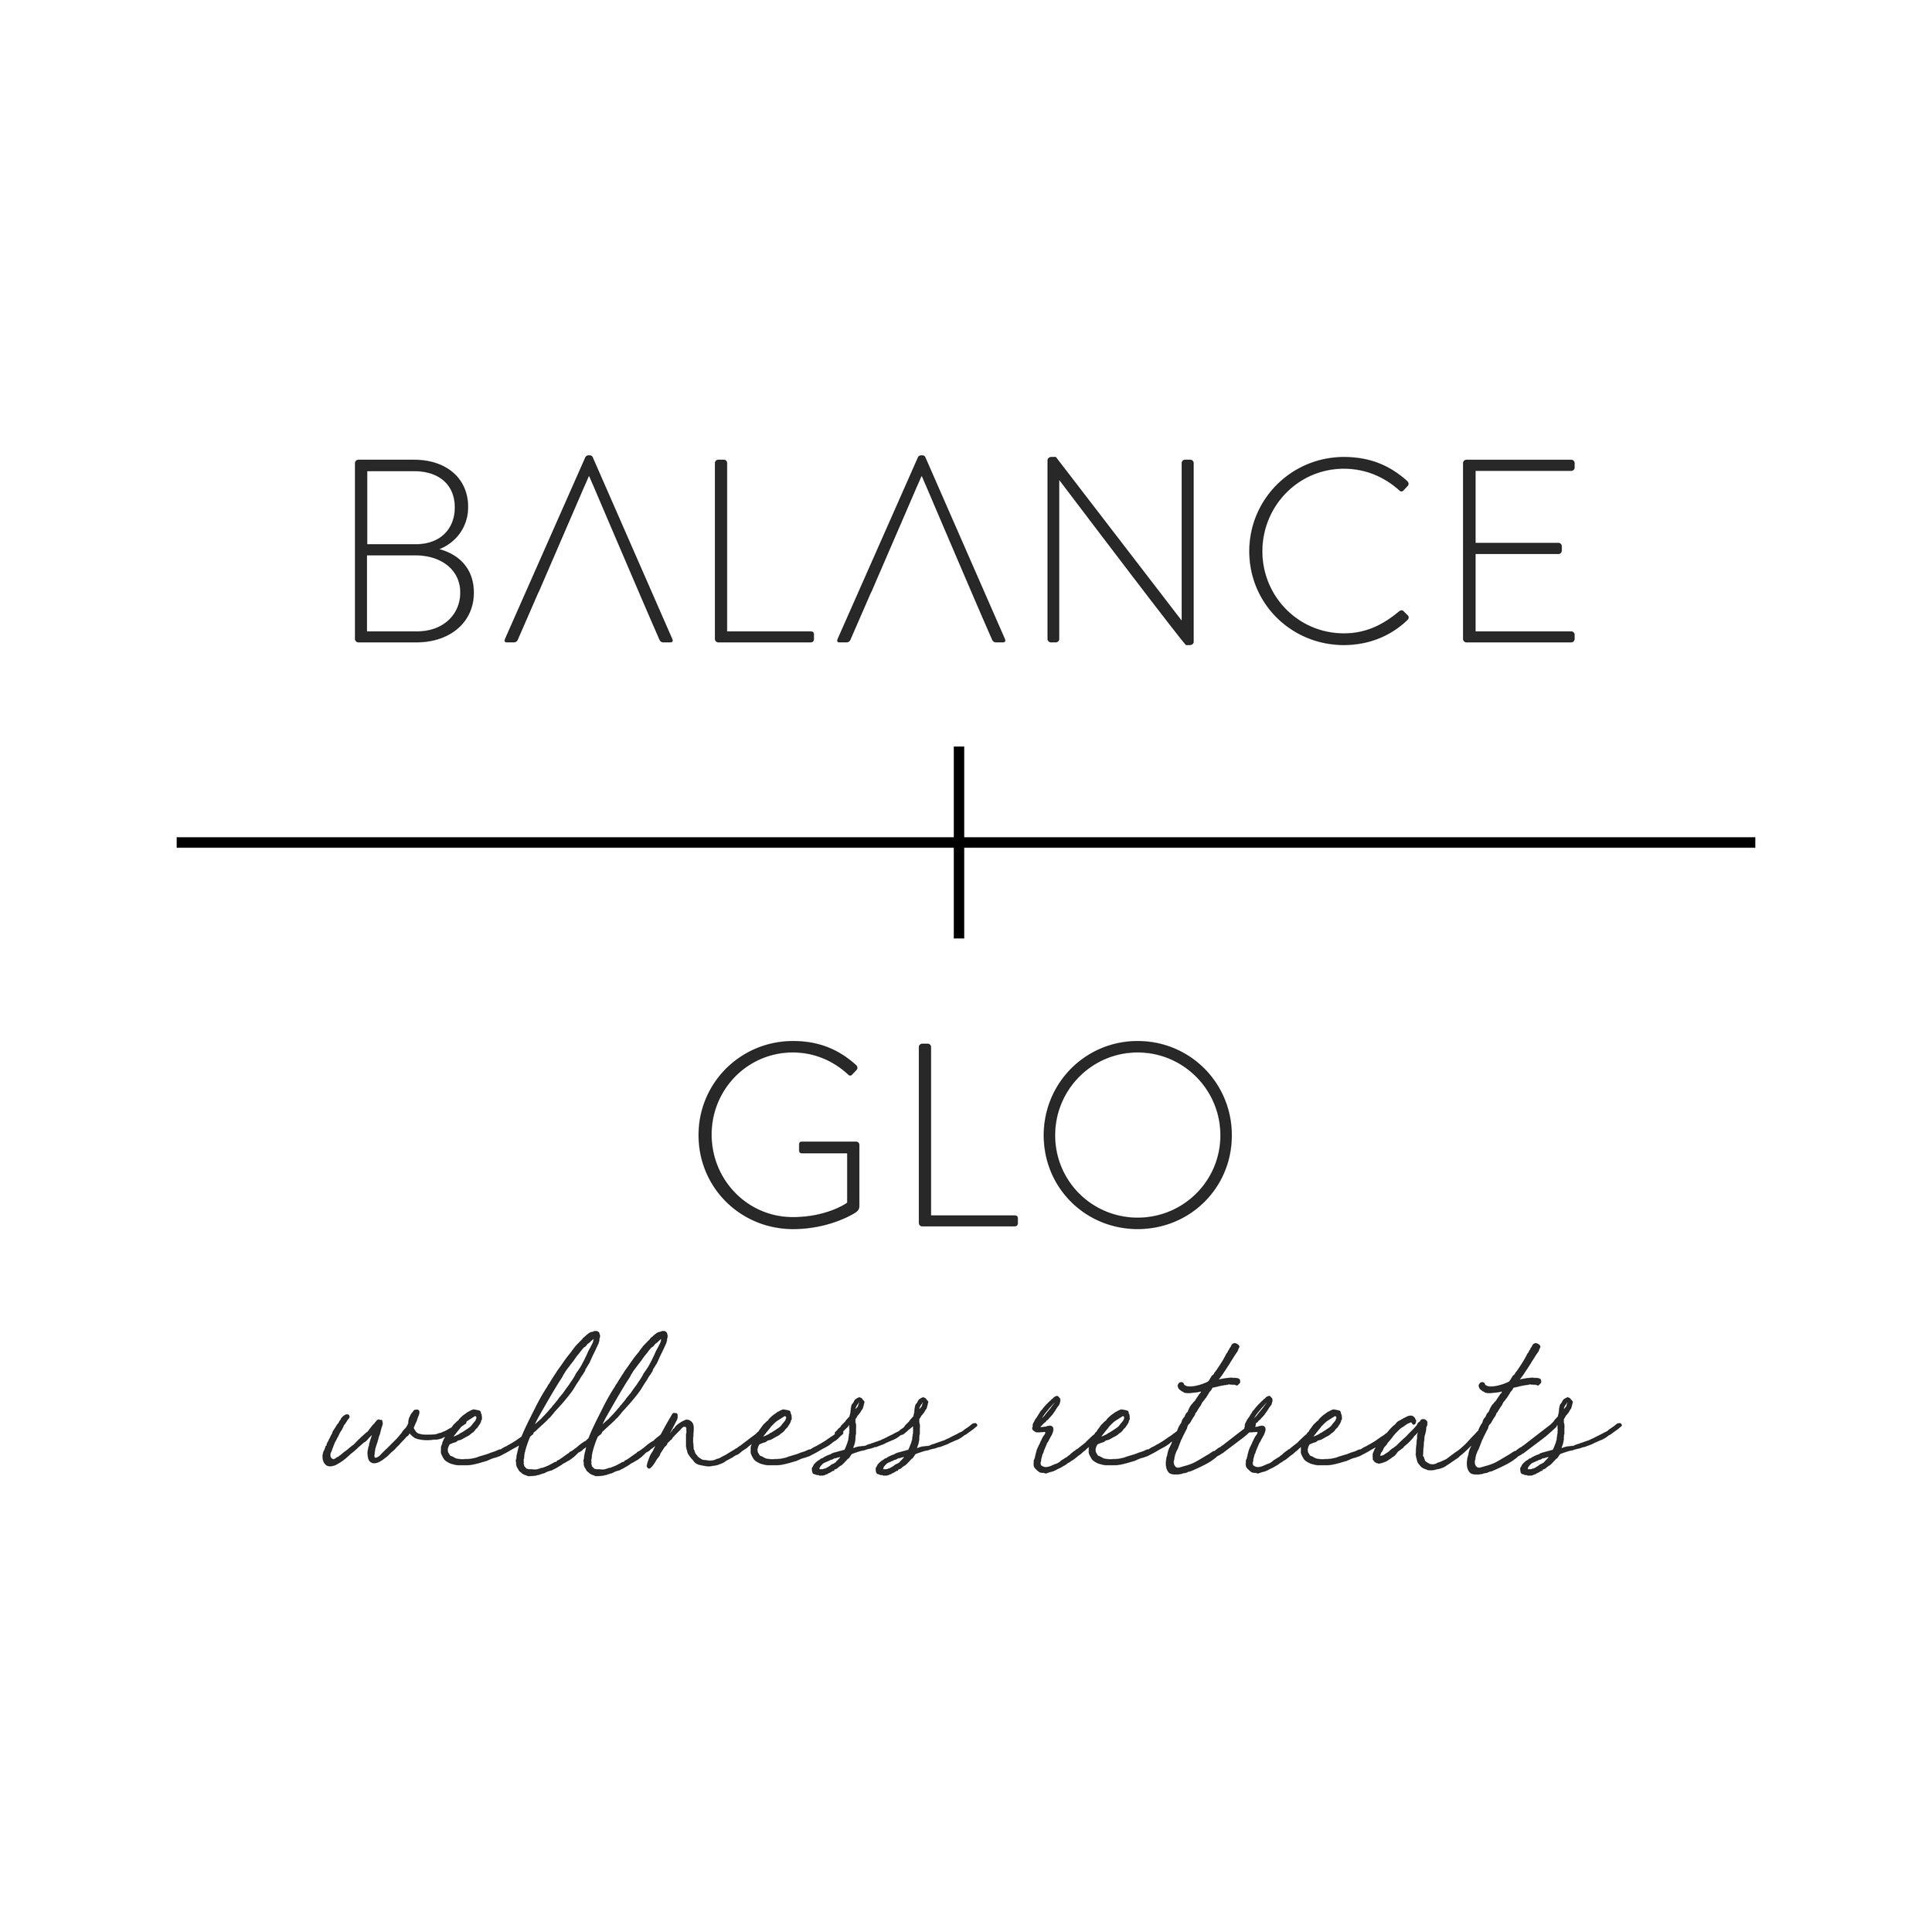 balanceglo_wellness_bw (2).jpg